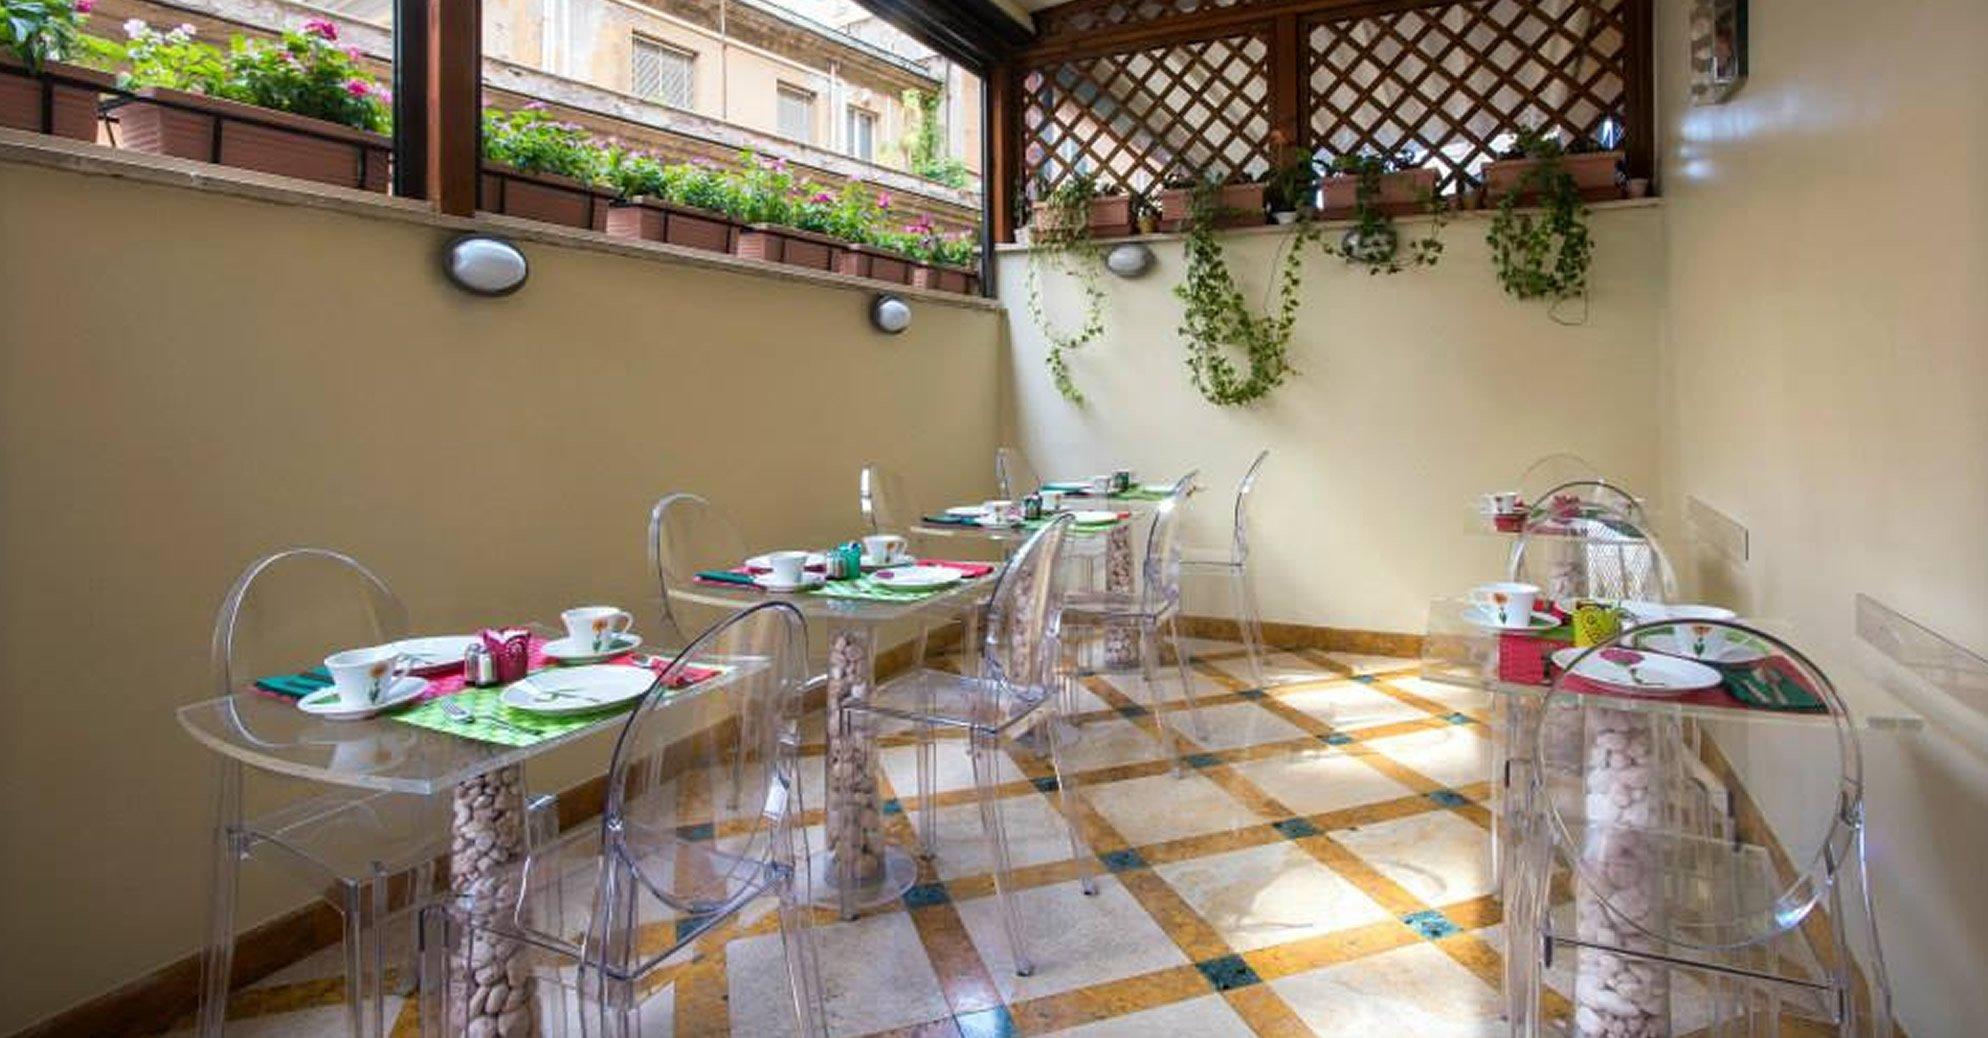 I giardini del quirinale rome official website - I giardini del quirinale ...